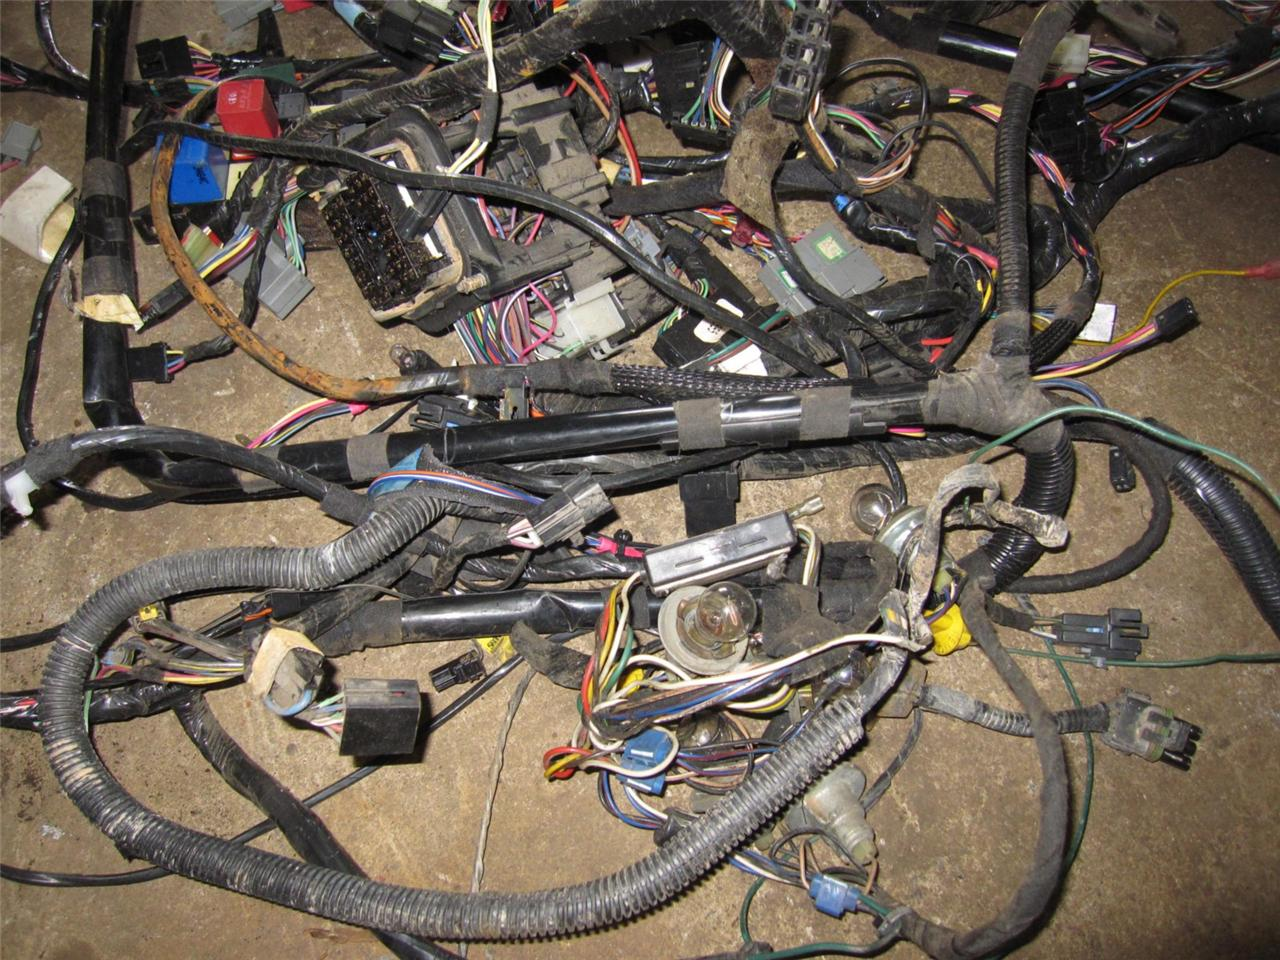 96 jeep cherokee under hood fuse box diagram jeep cherokee under dash wiring jeep cherokee complete interior wiring harness under dash ...